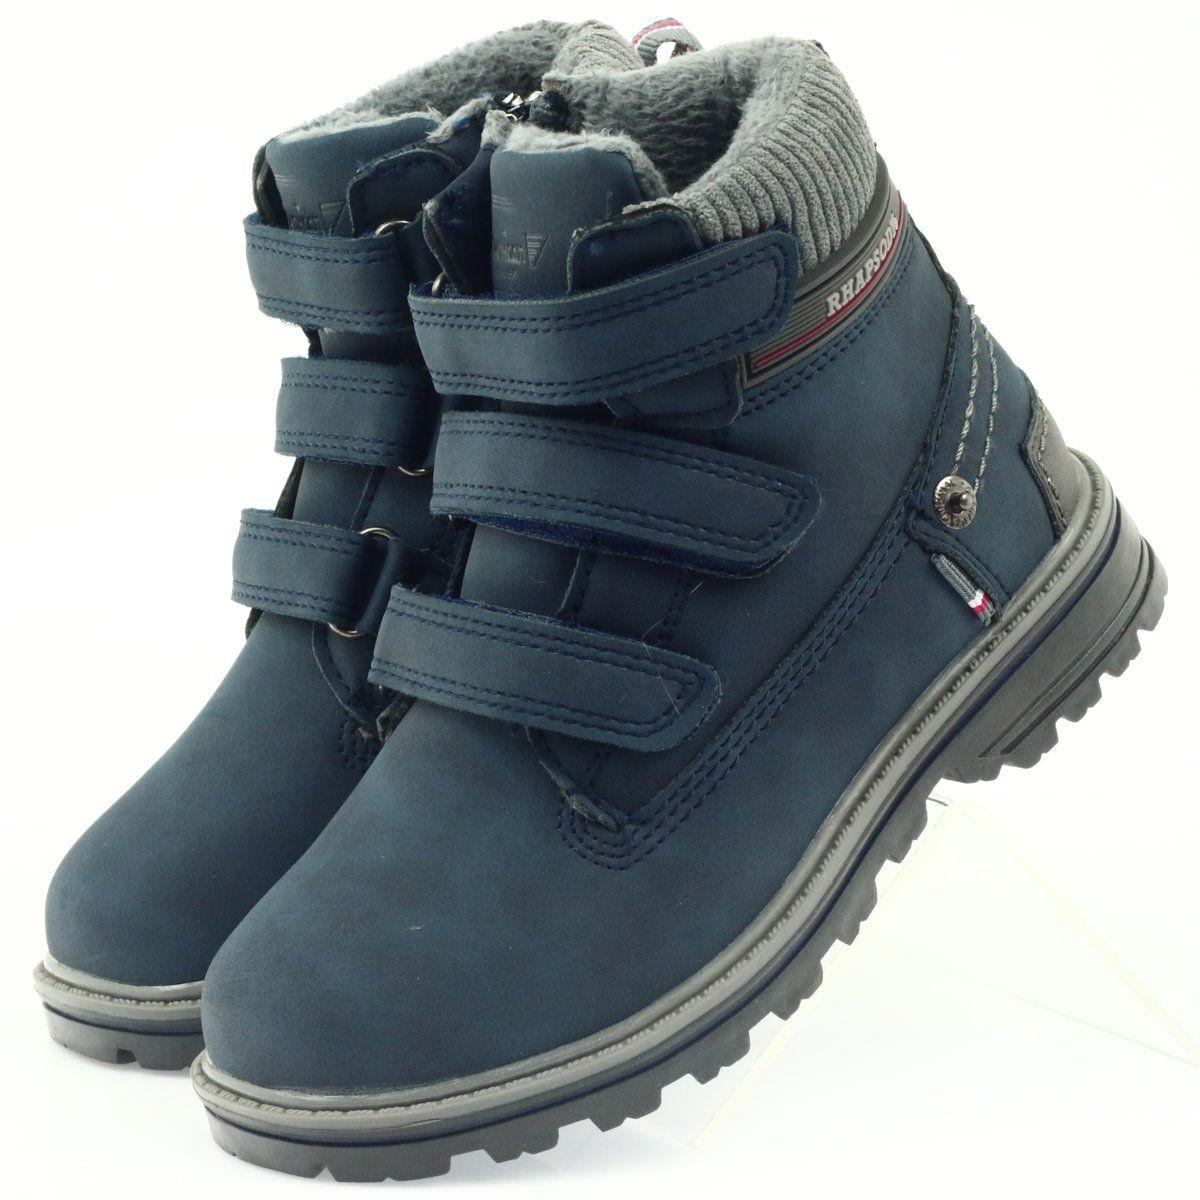 American Club American Kozaki Trzewiki Buty Zimowe 708121 Szare Granatowe Hiking Boots Timberland Boots Boots